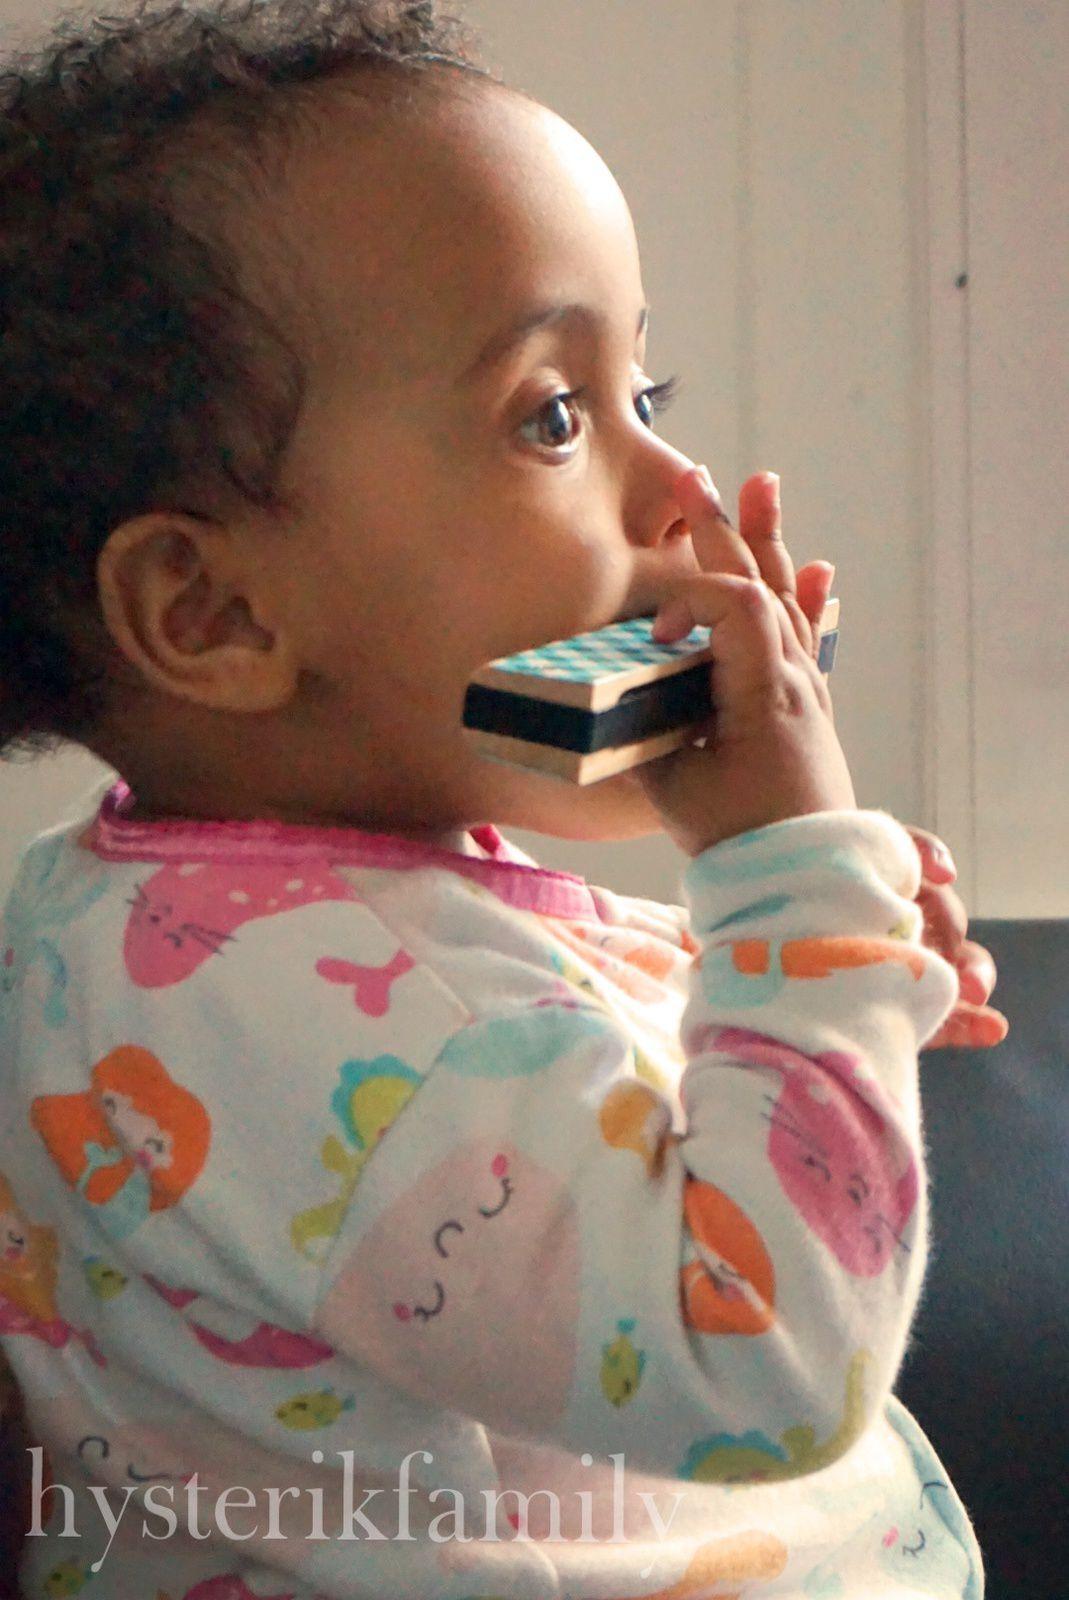 Eveil musical de bébé #2 : l'harmonica